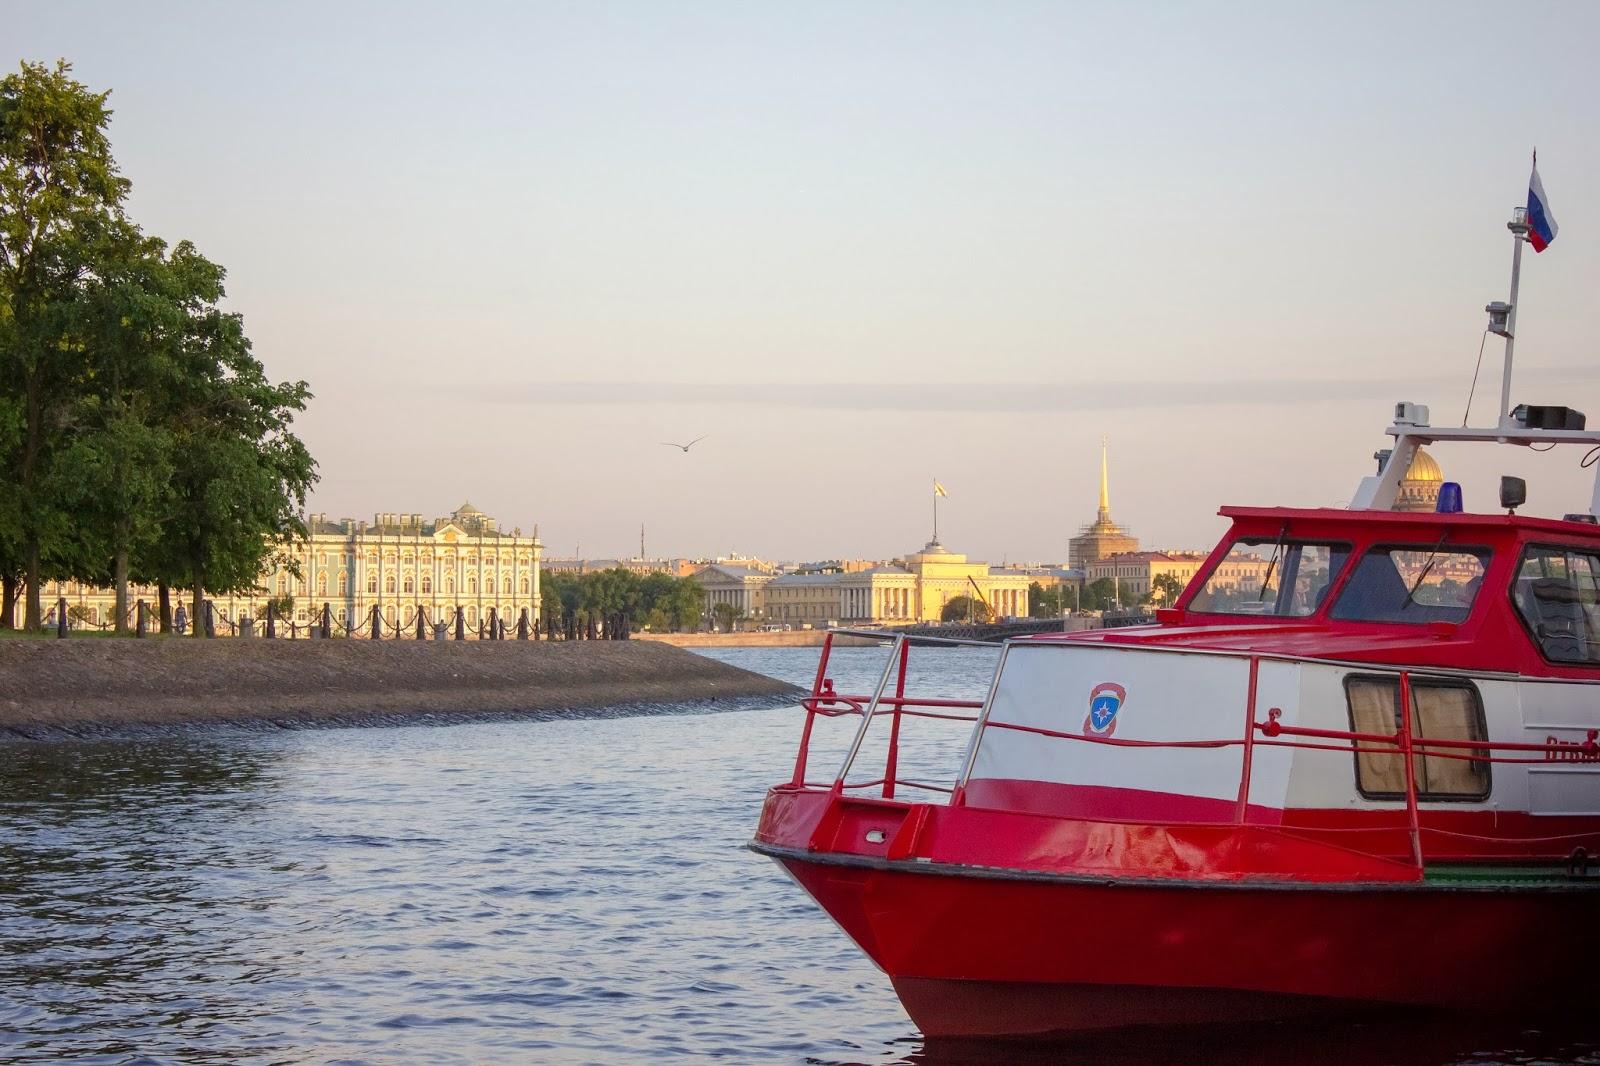 Санкт-Петербург, Россия, Нева